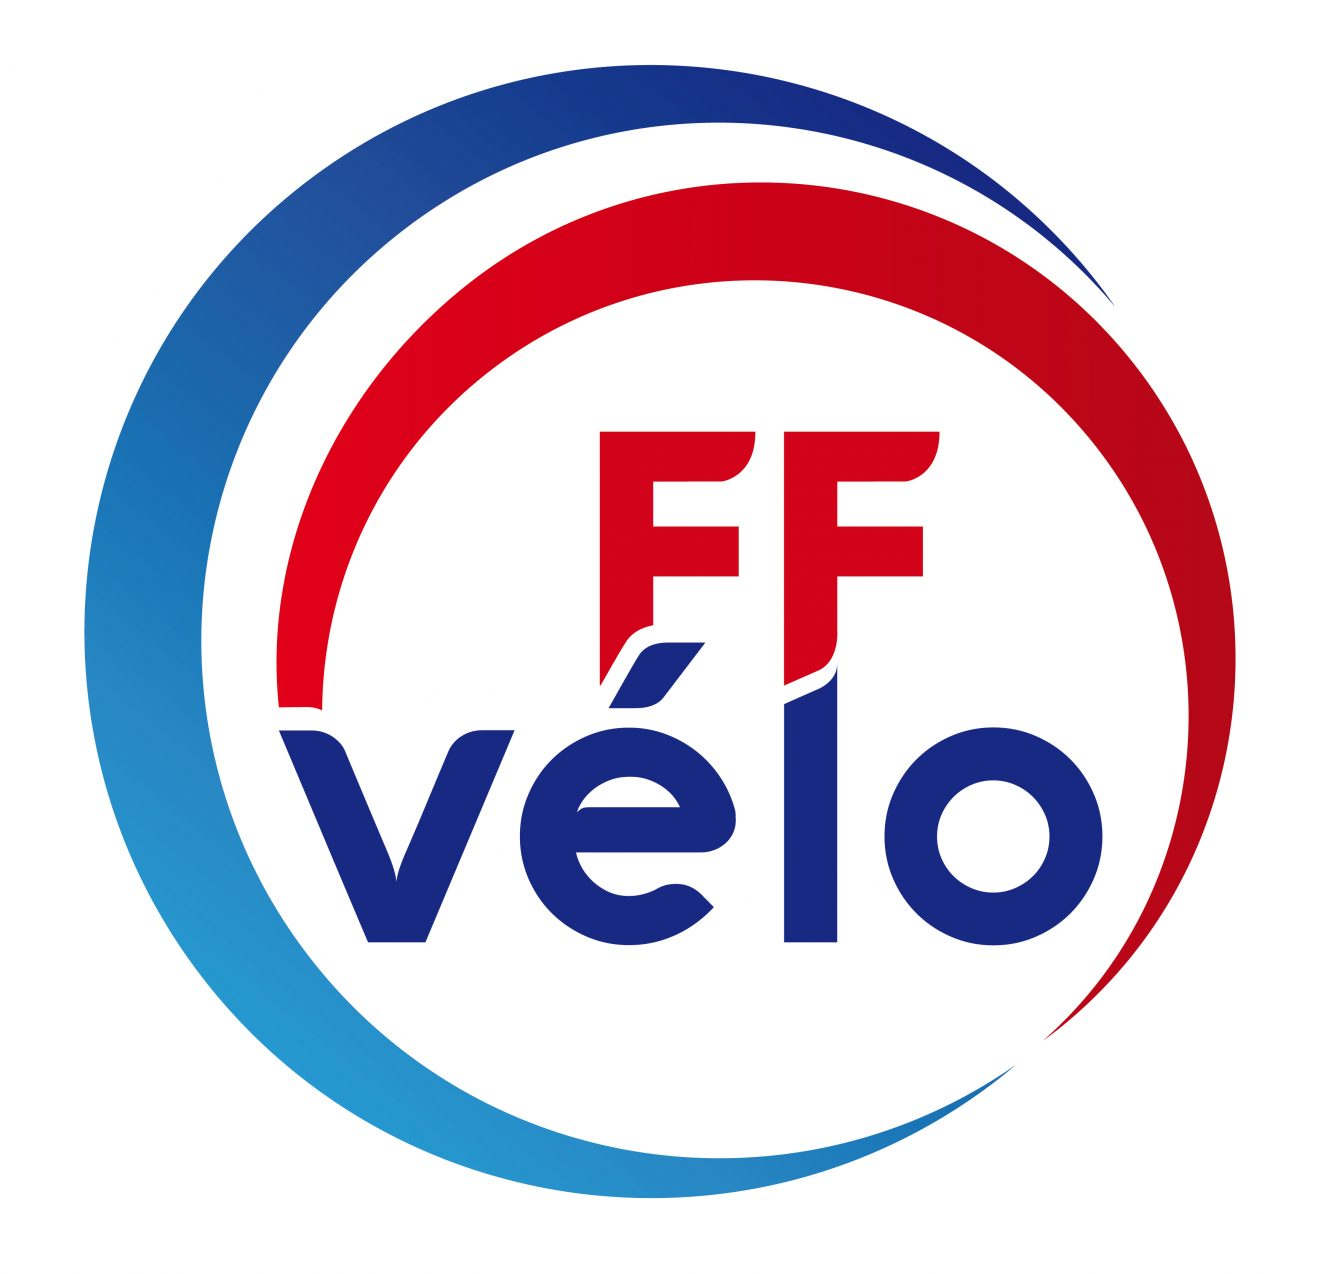 FFVELO_logo